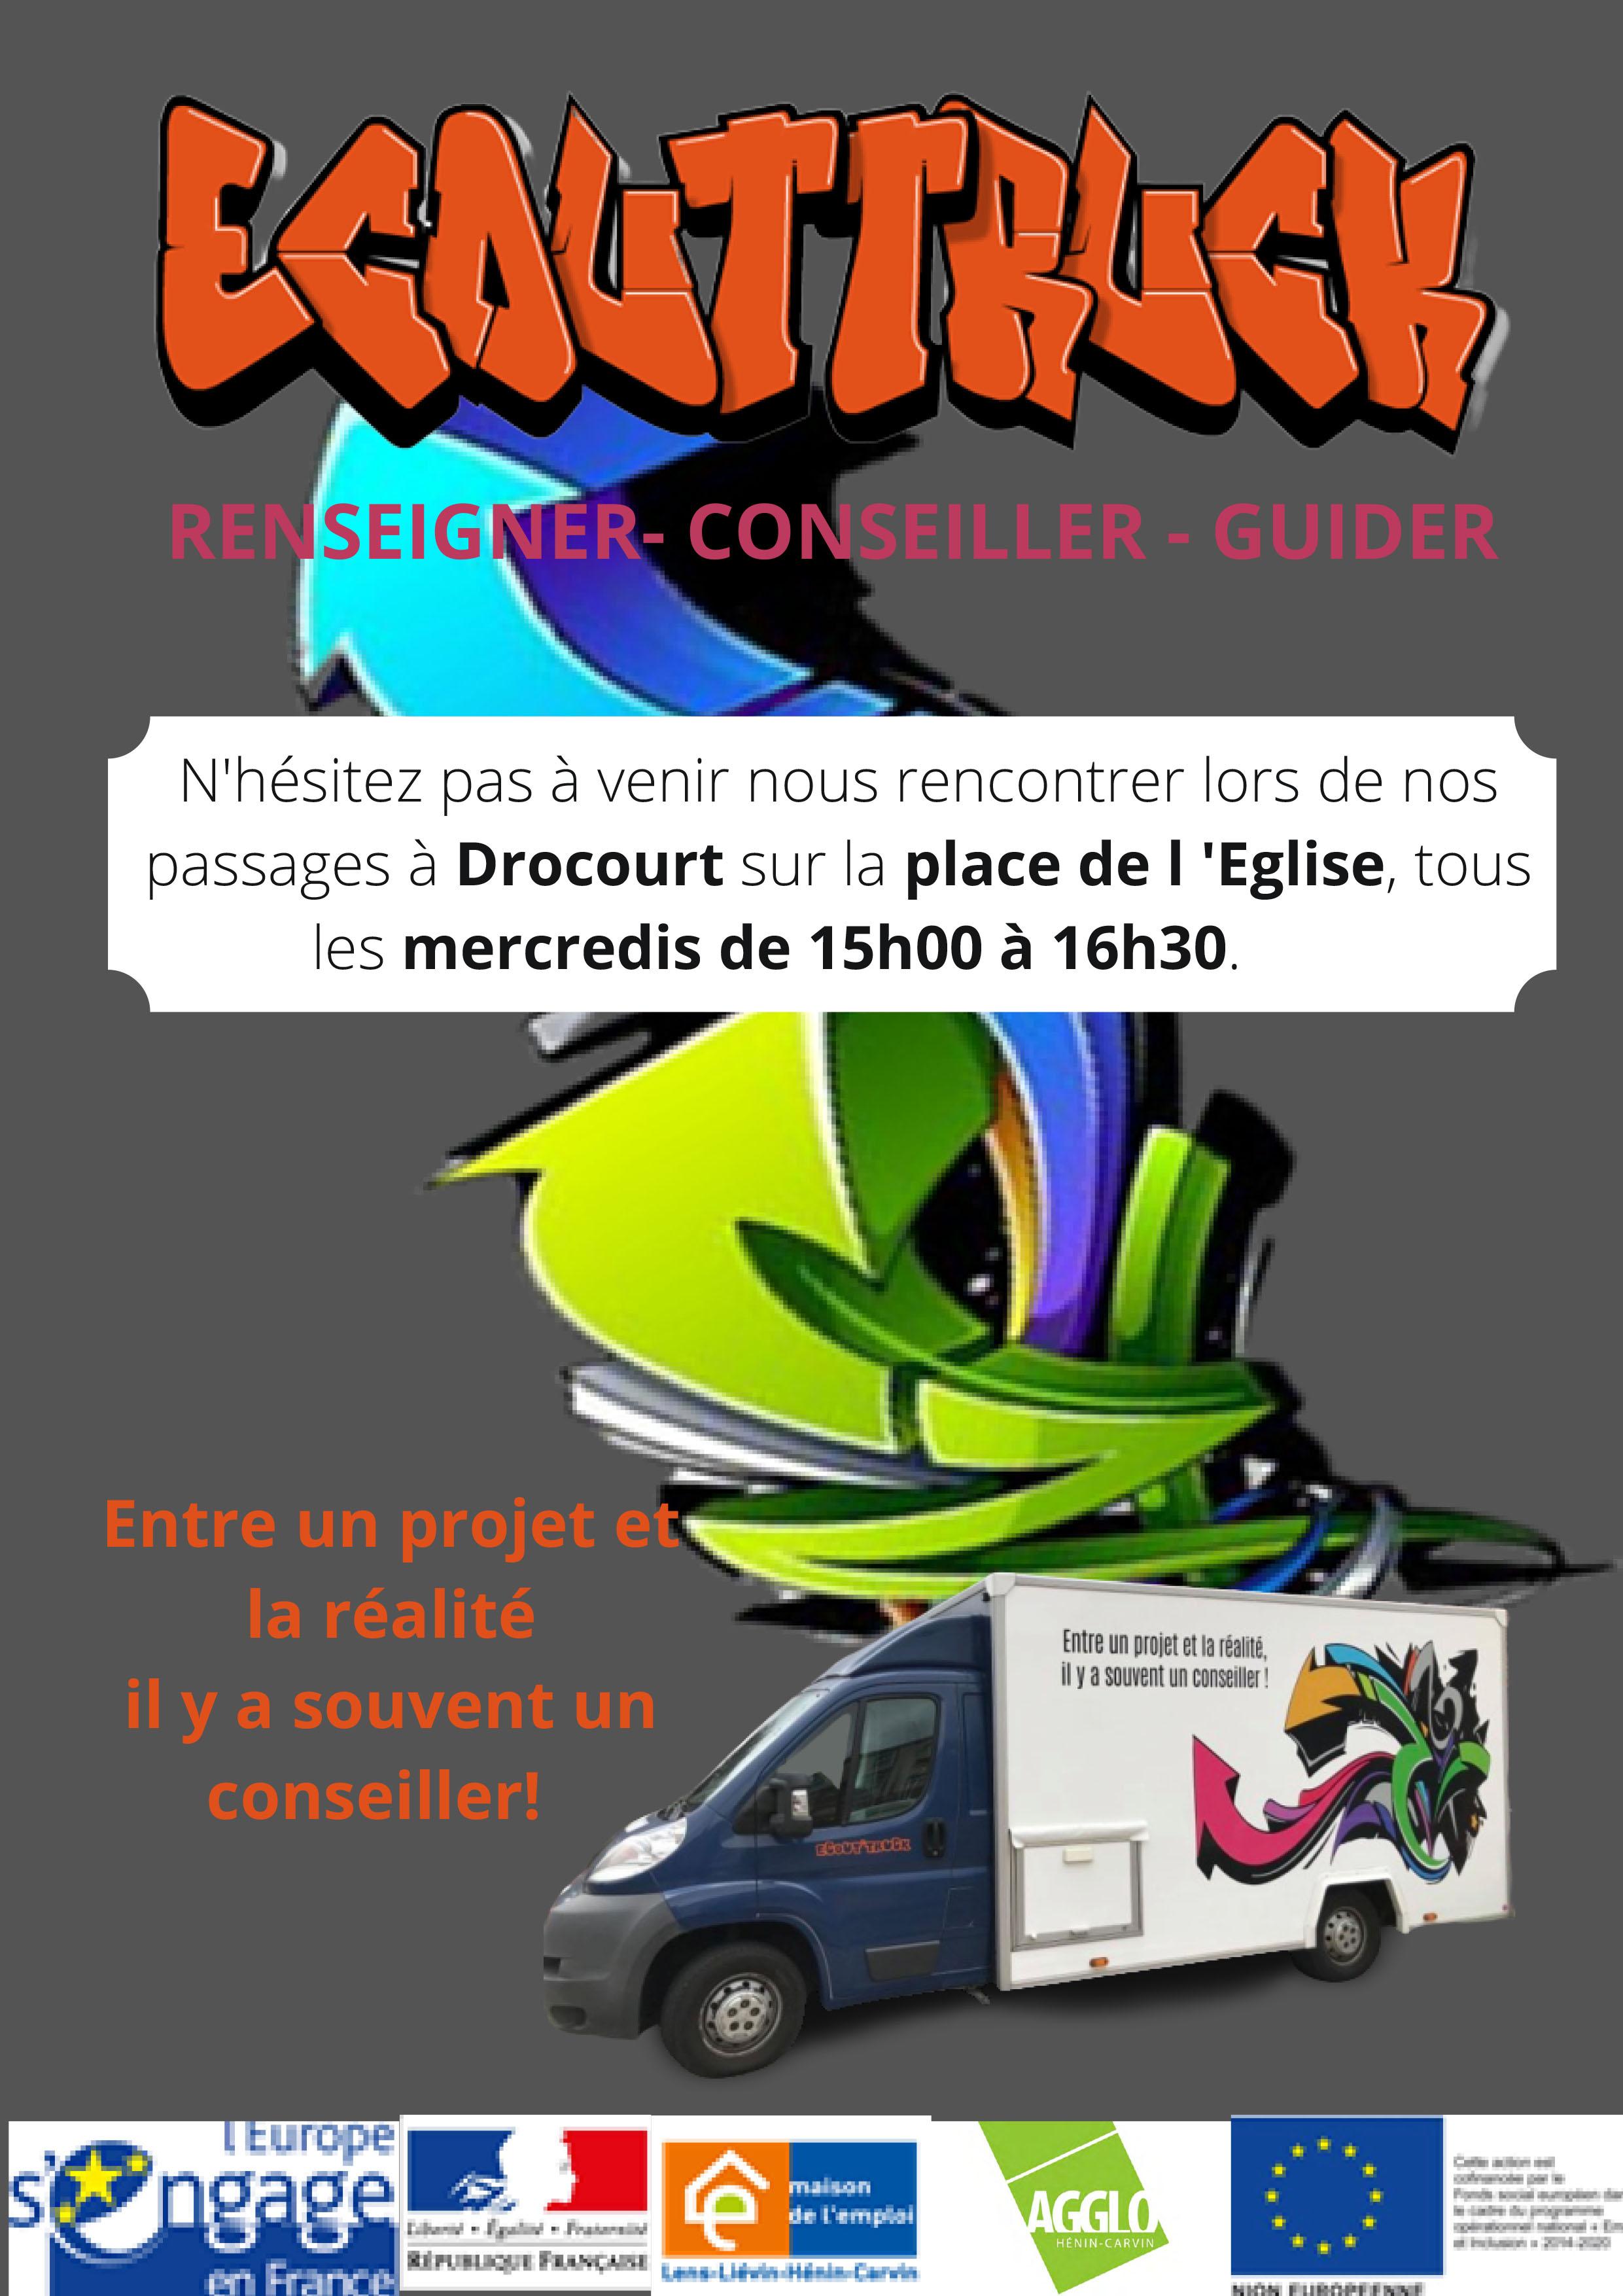 Ecout_Truck drocourt-1.jpg